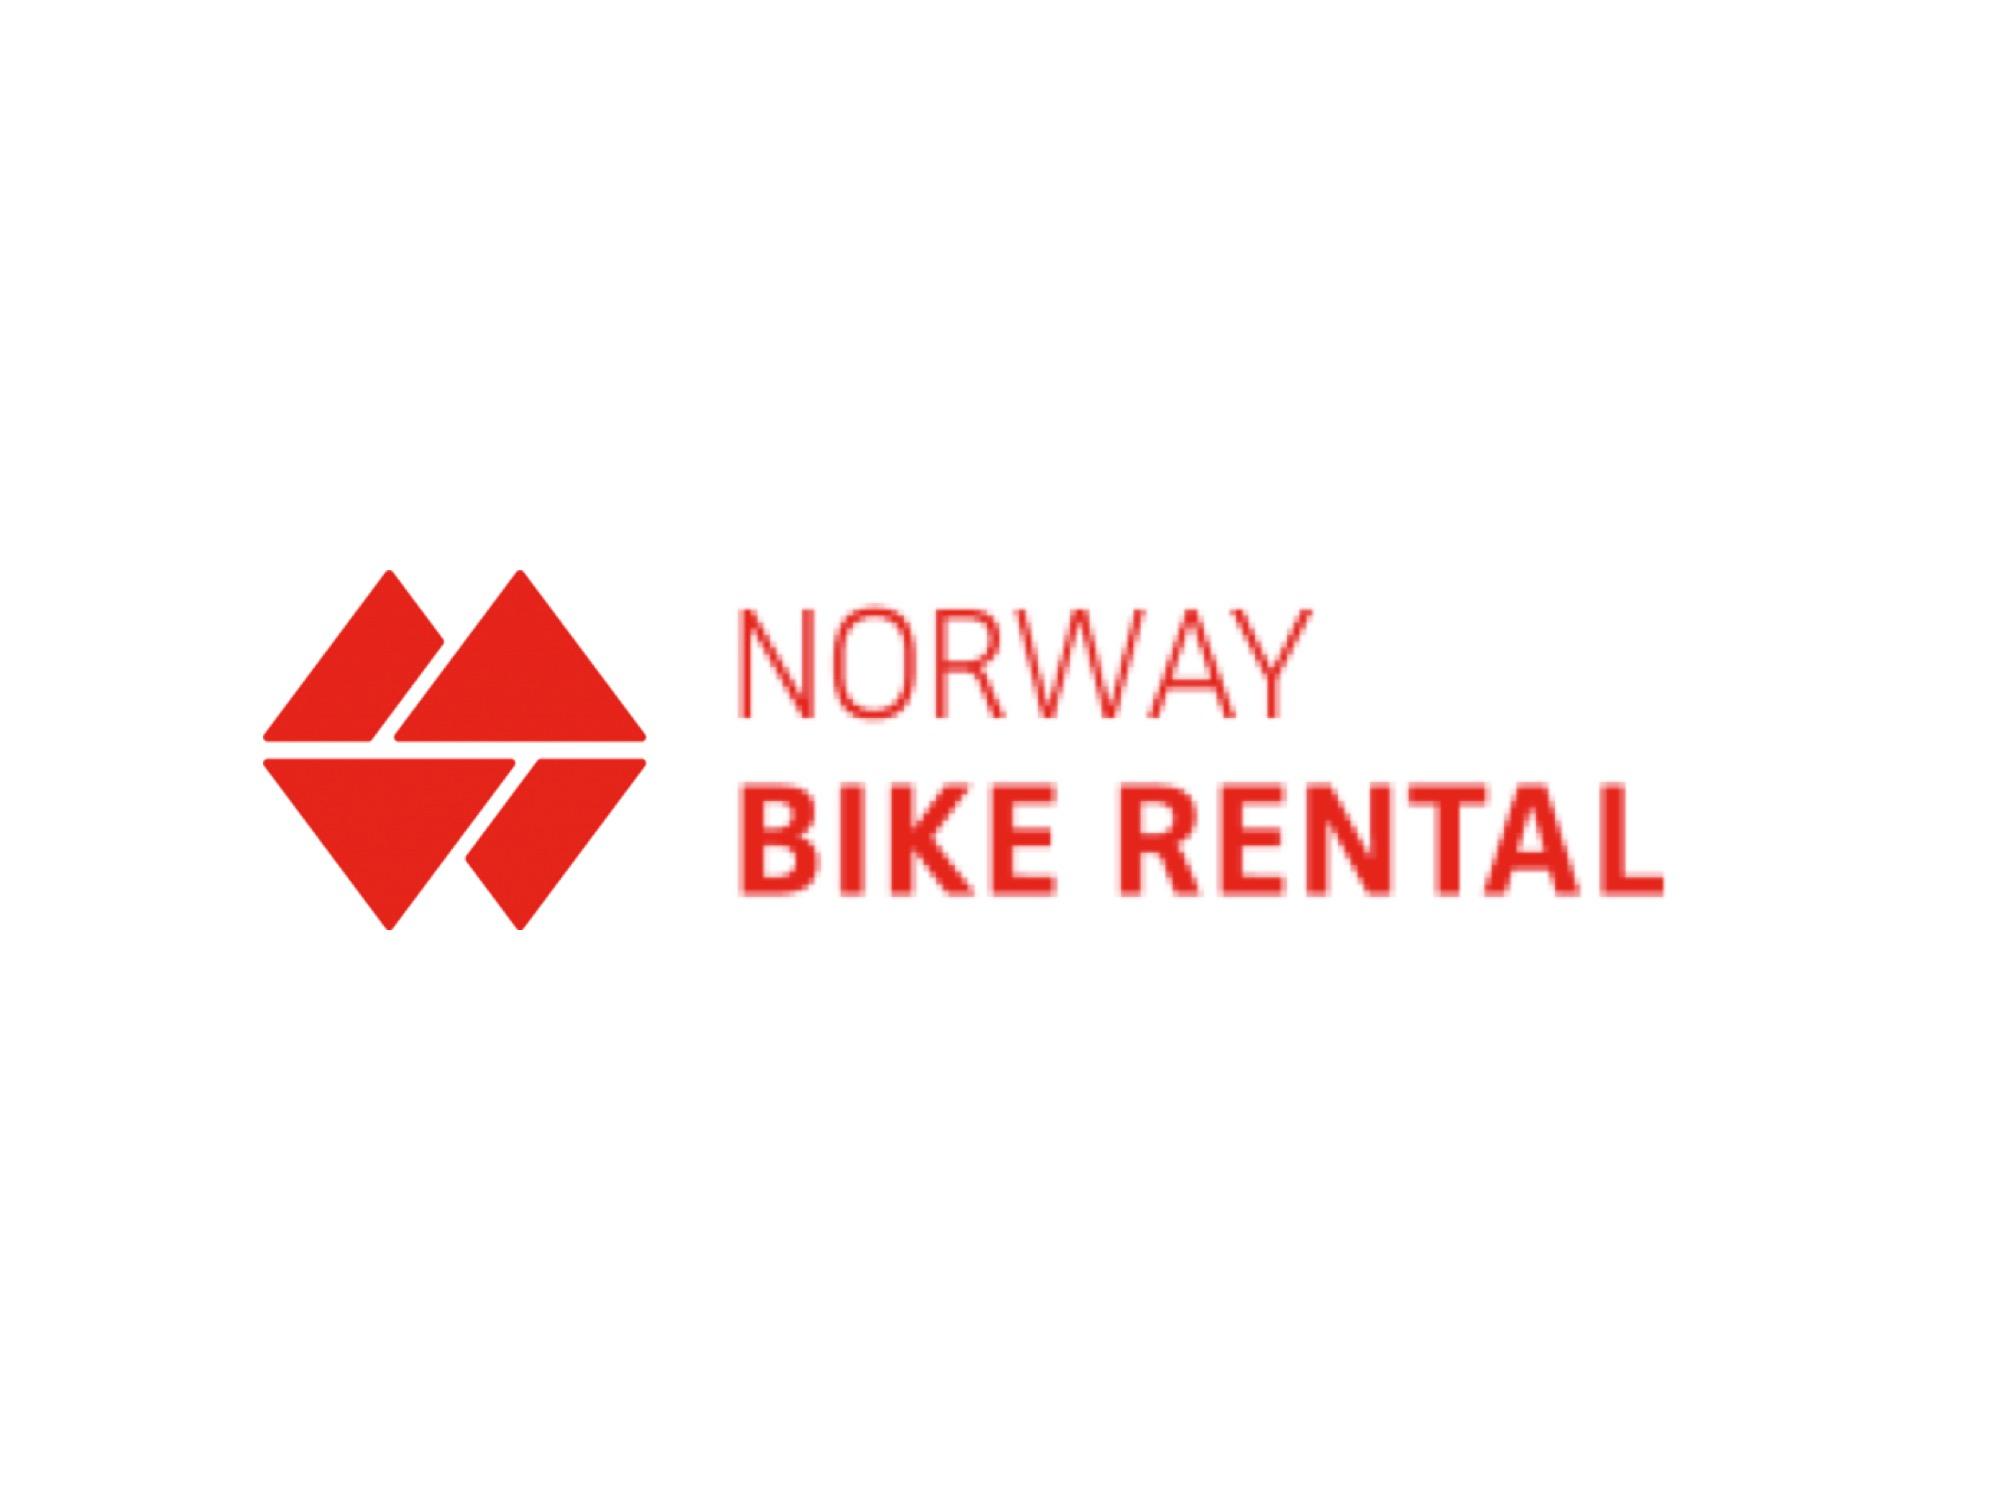 Norway Bike Rental.jpeg